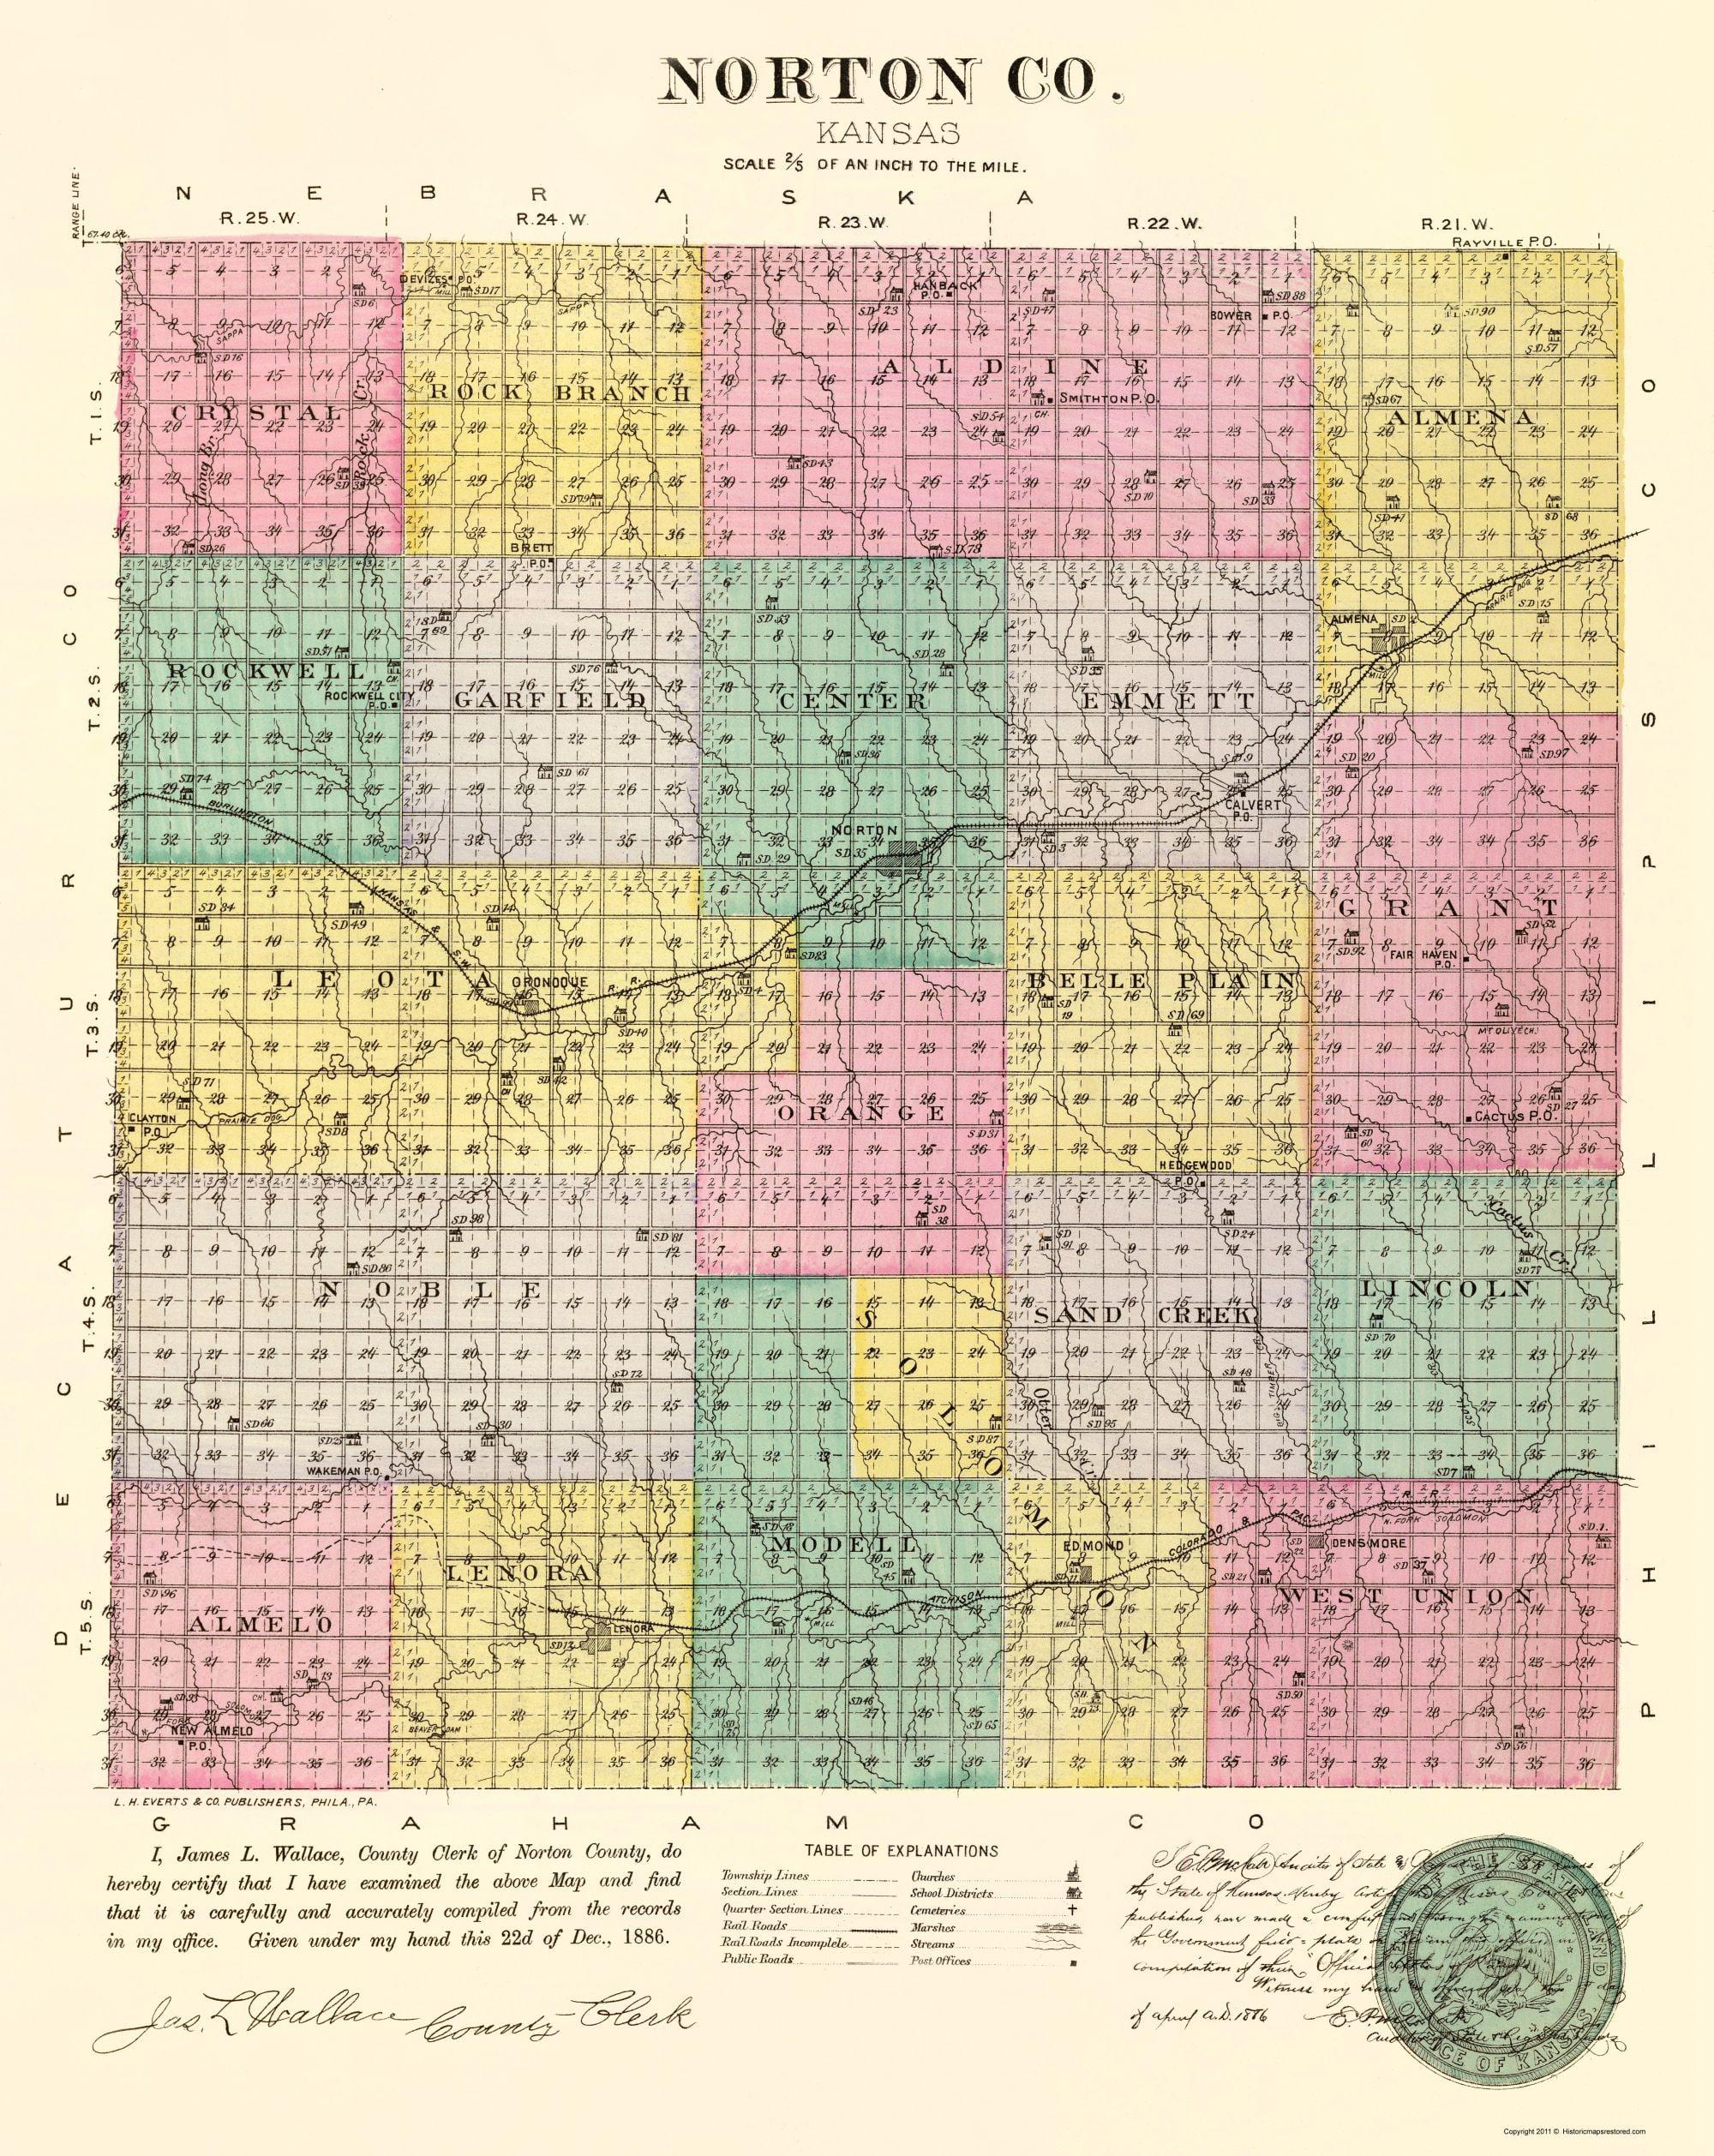 Old Kansas Map.Old County Map Norton Kansas Everts 1887 23 X 28 94 Walmart Com